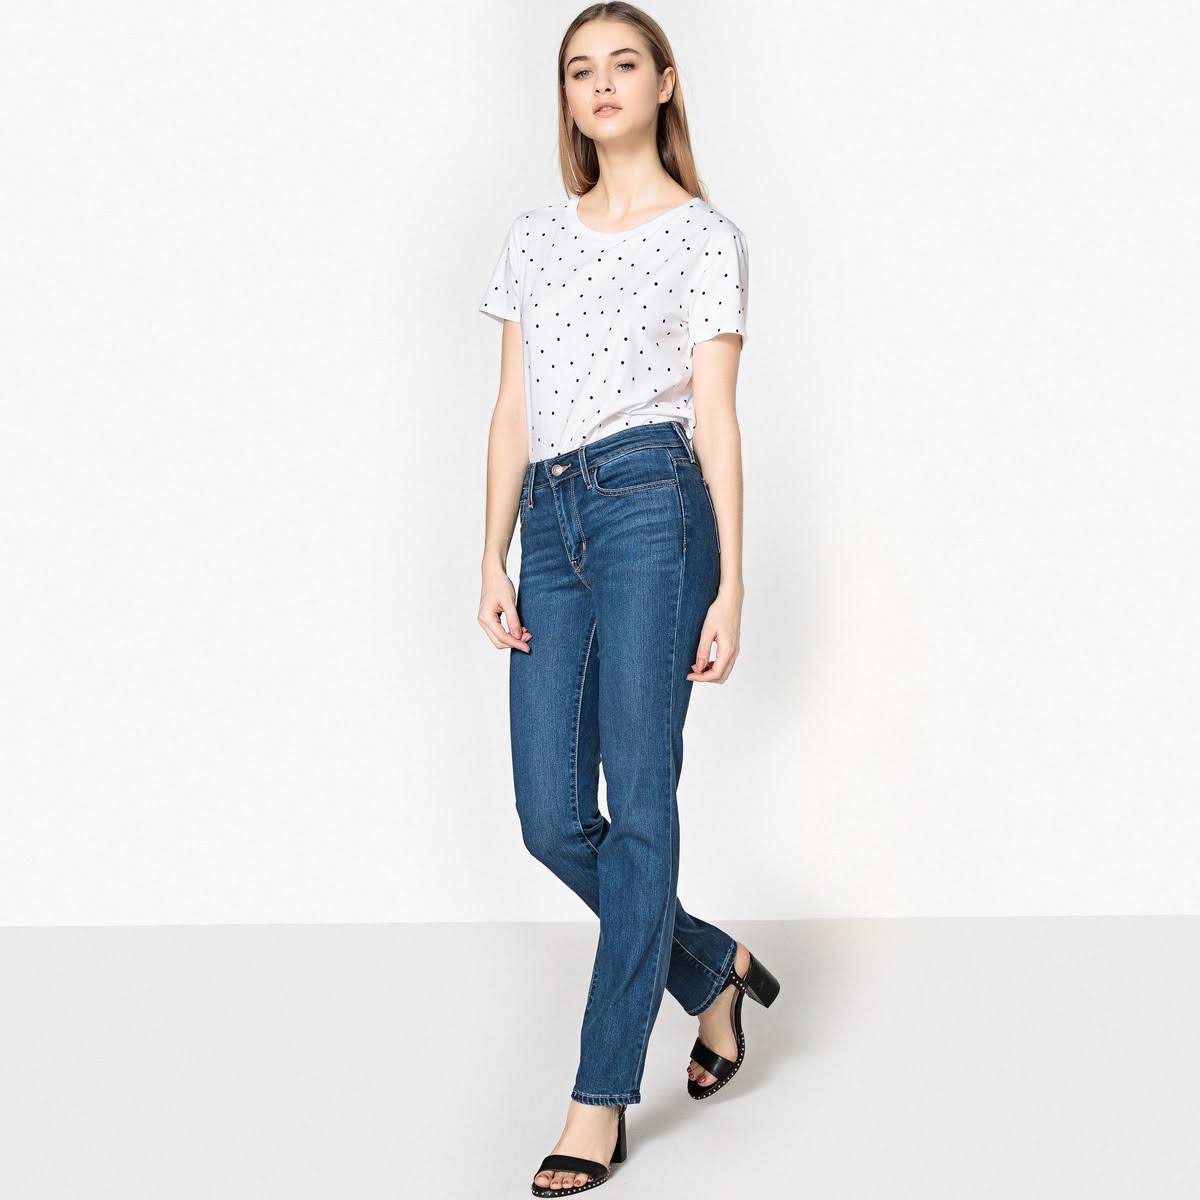 Rinse Jeans Straight Levi's 714 Deadstock AxYwIISq